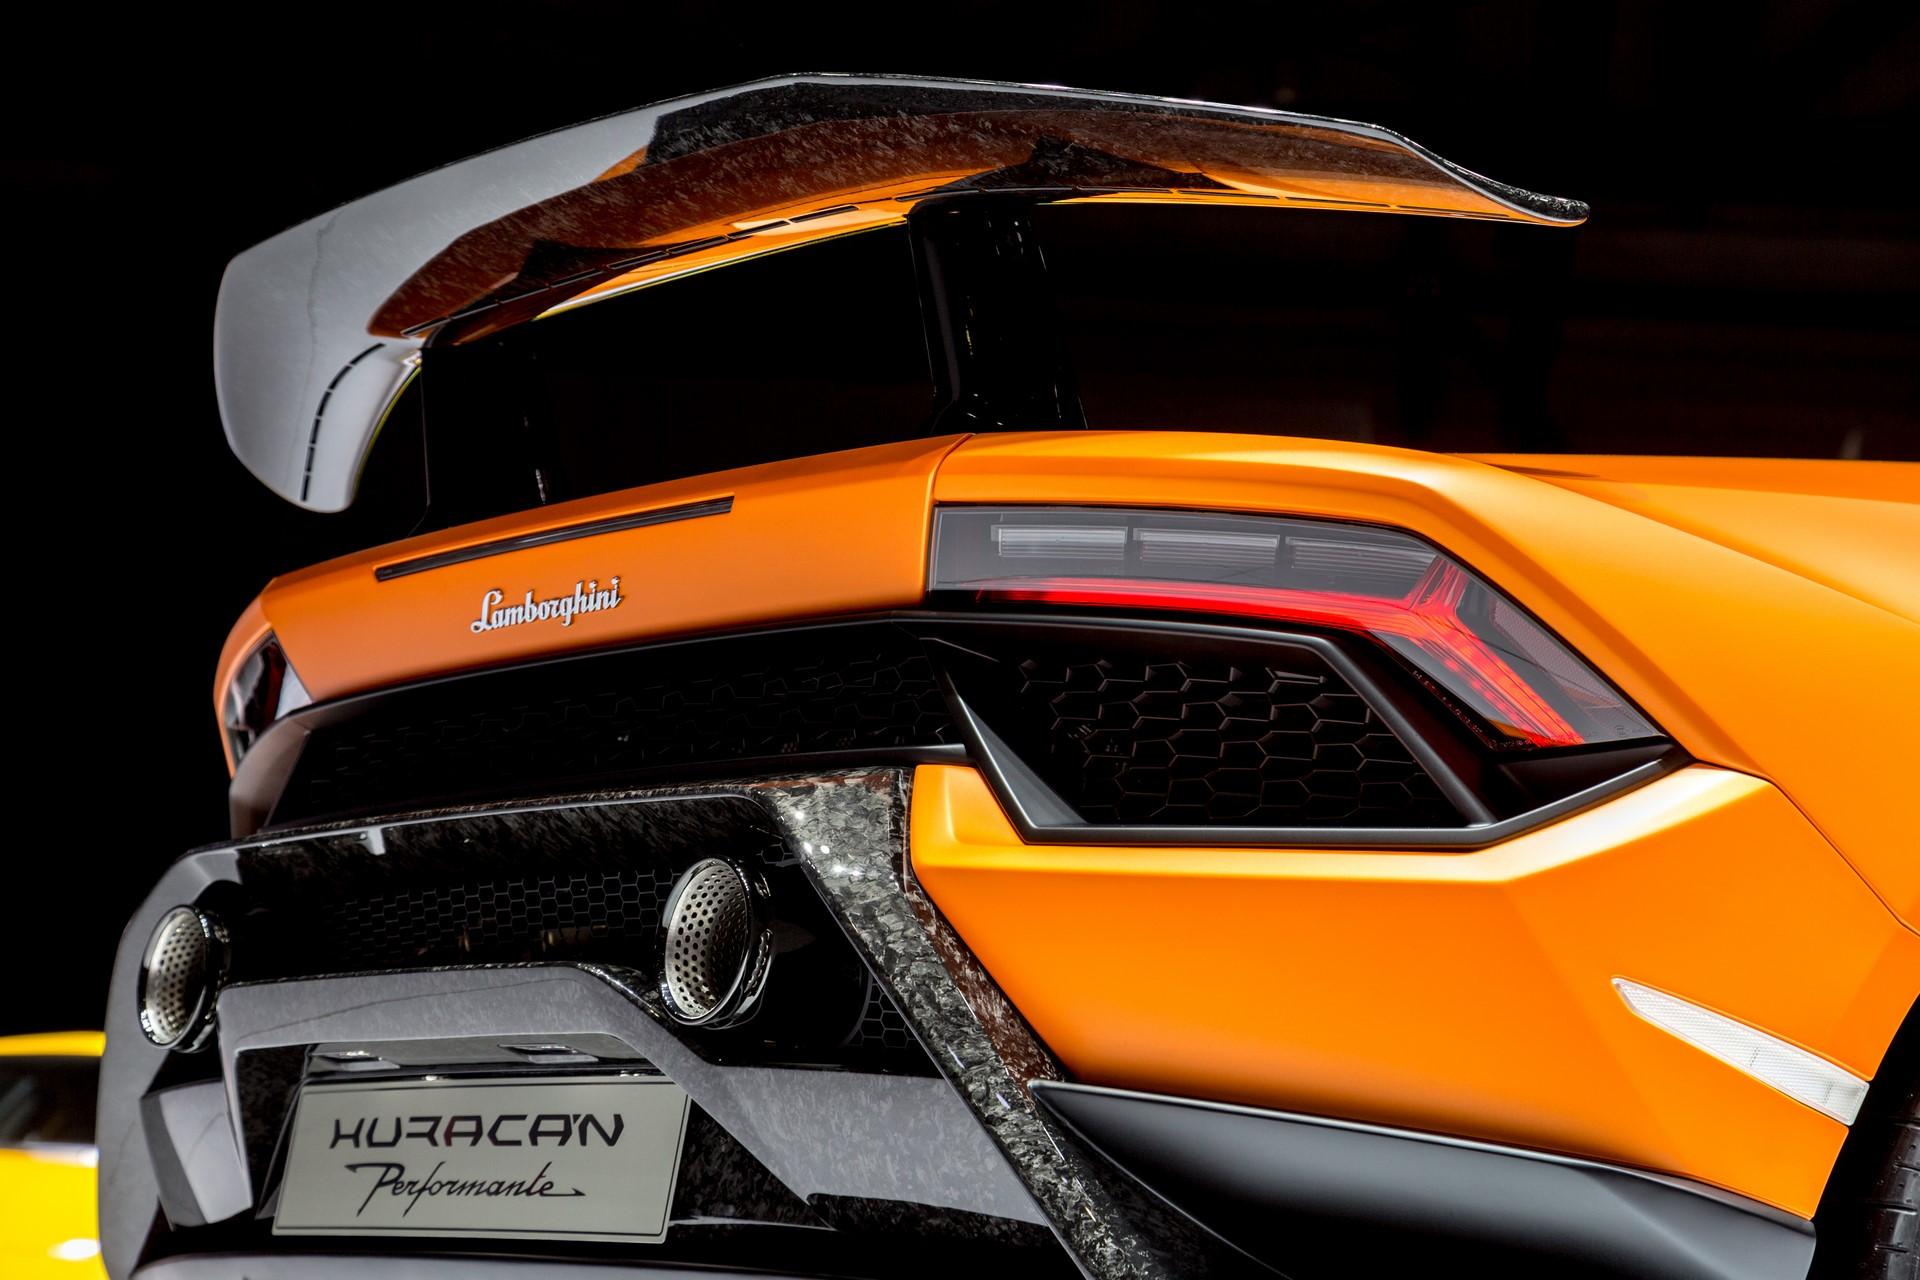 Lamborghini Huracan Performante Geneva 2017 (1)